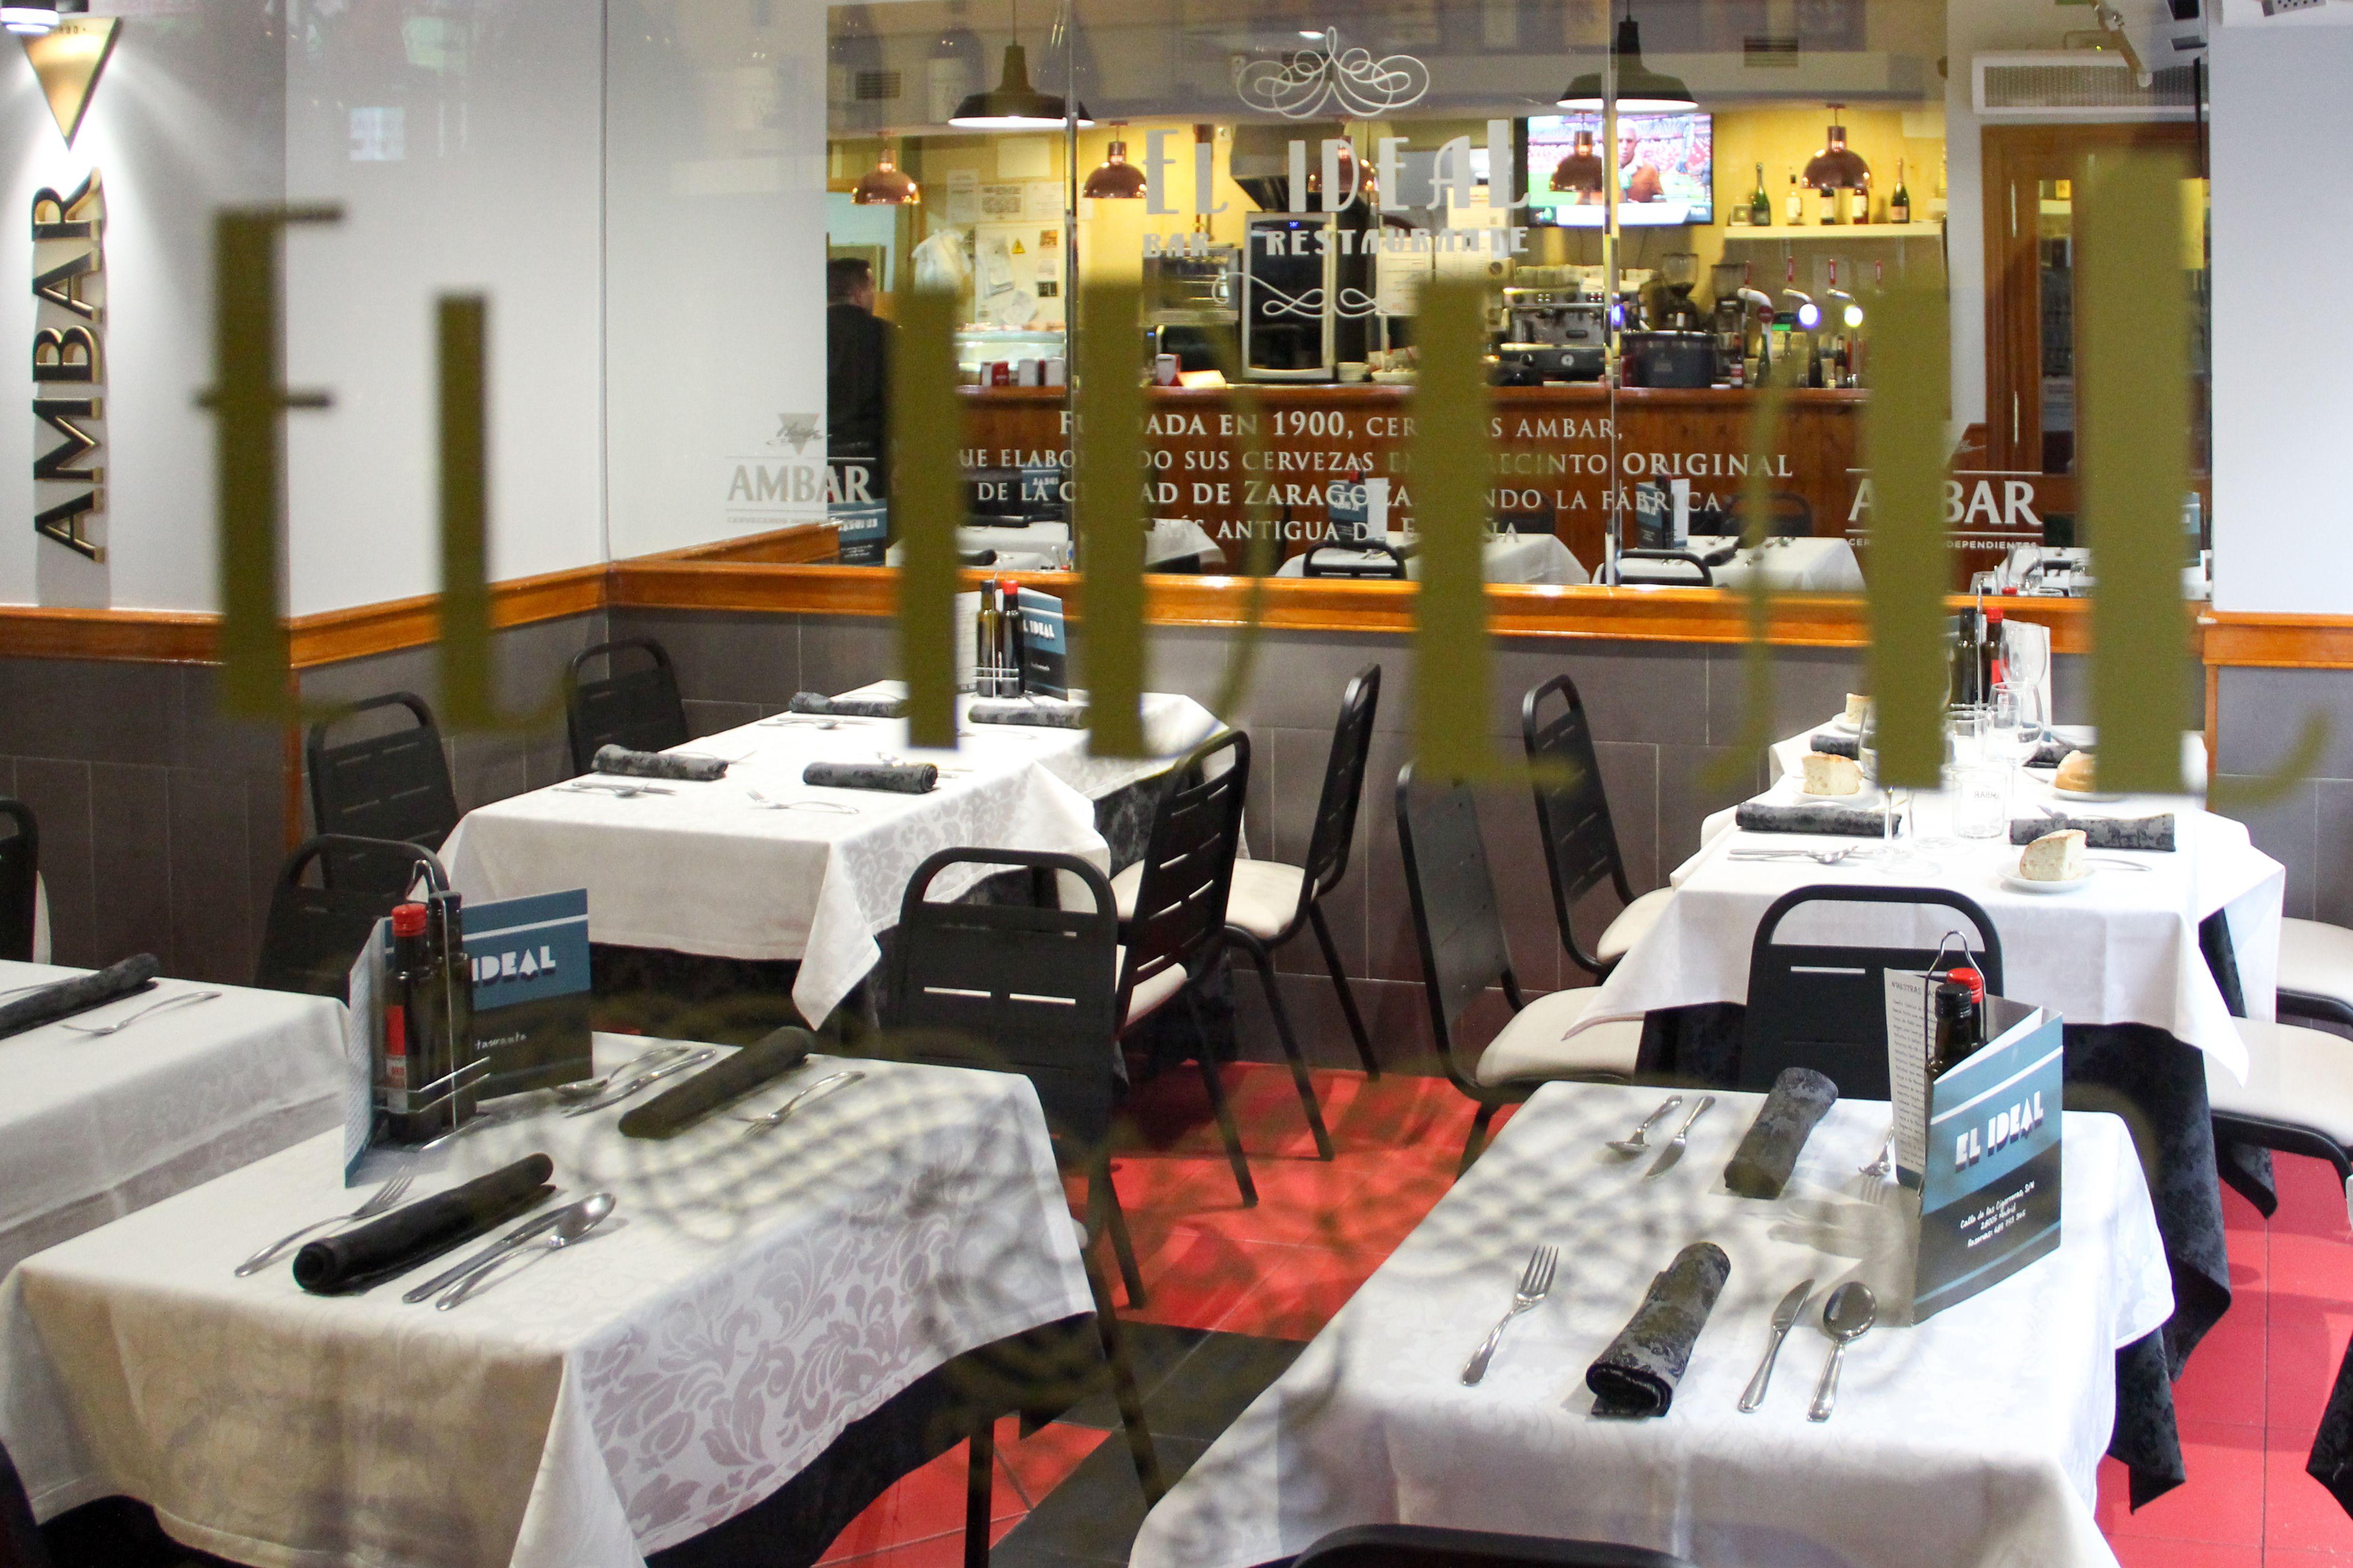 Restaurante El Ideal en Madrid